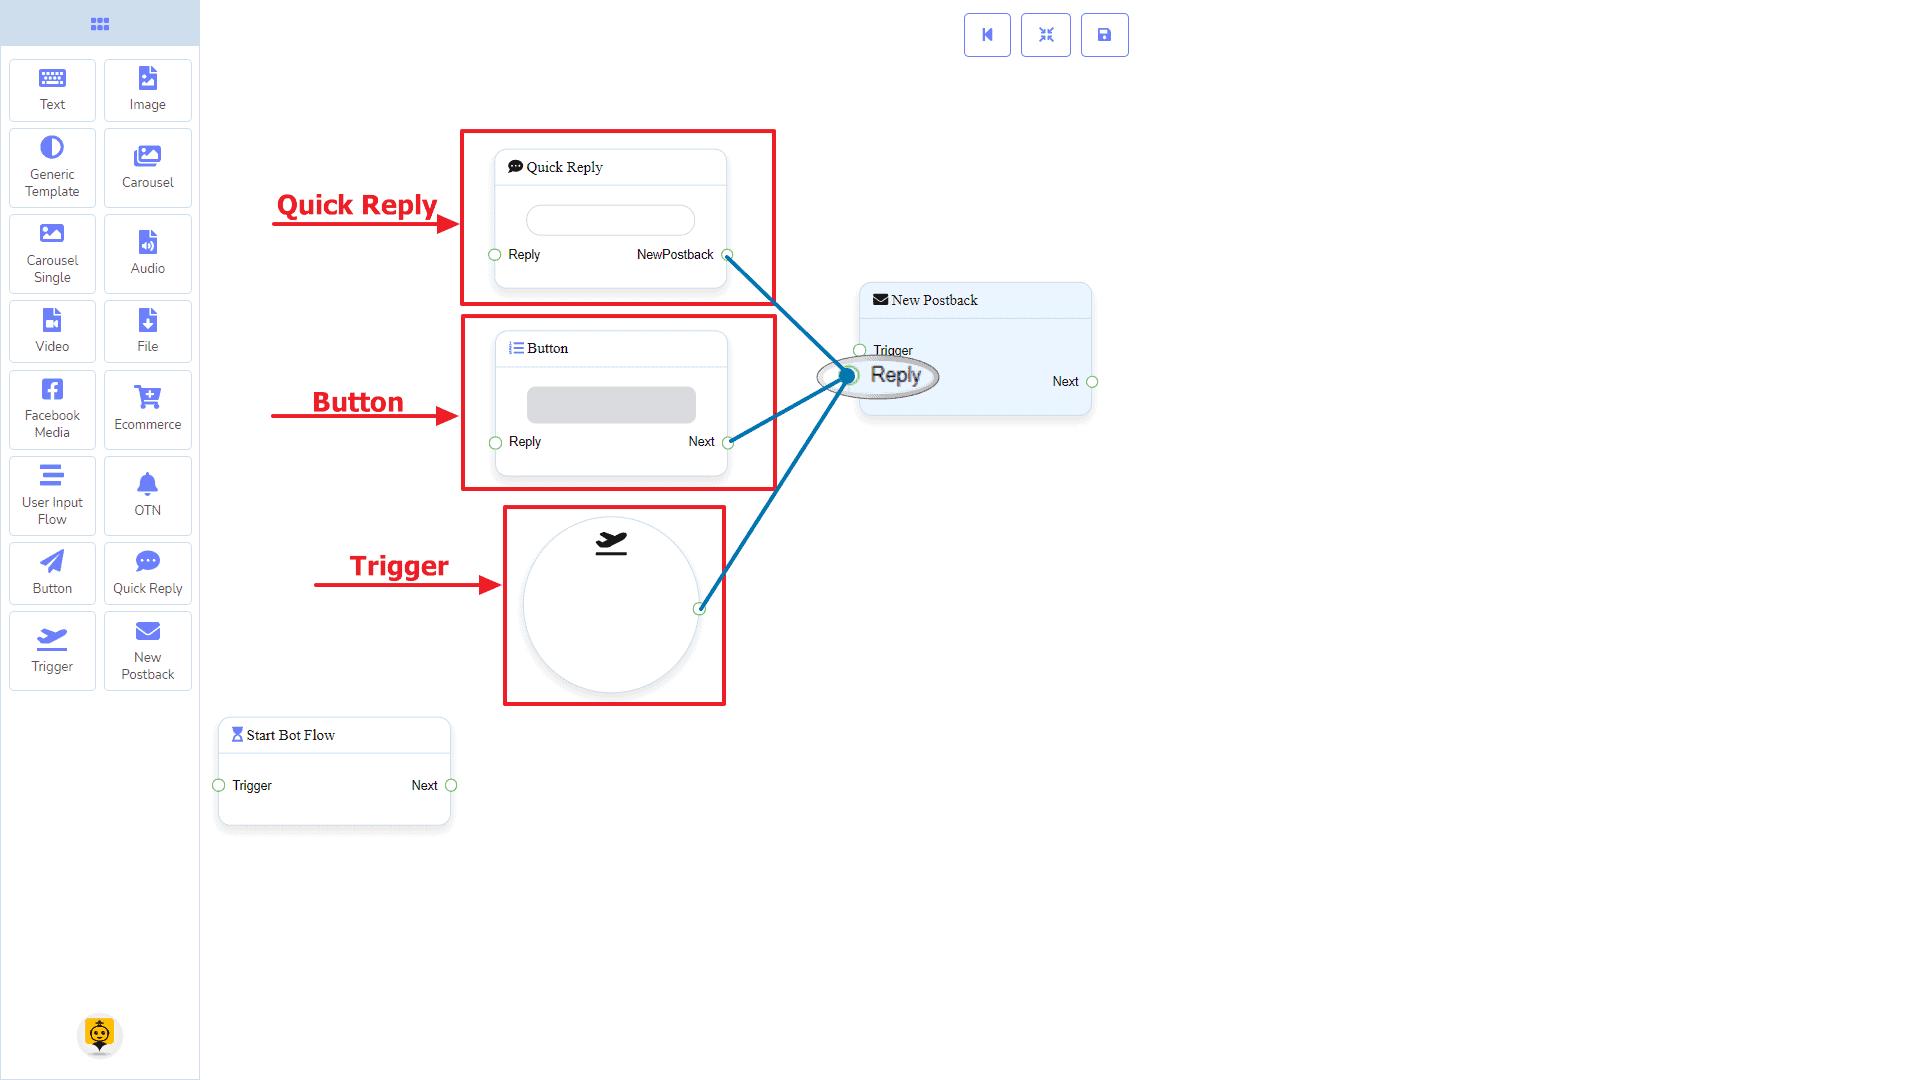 Messenger Bot - Visual Flow Builder 12